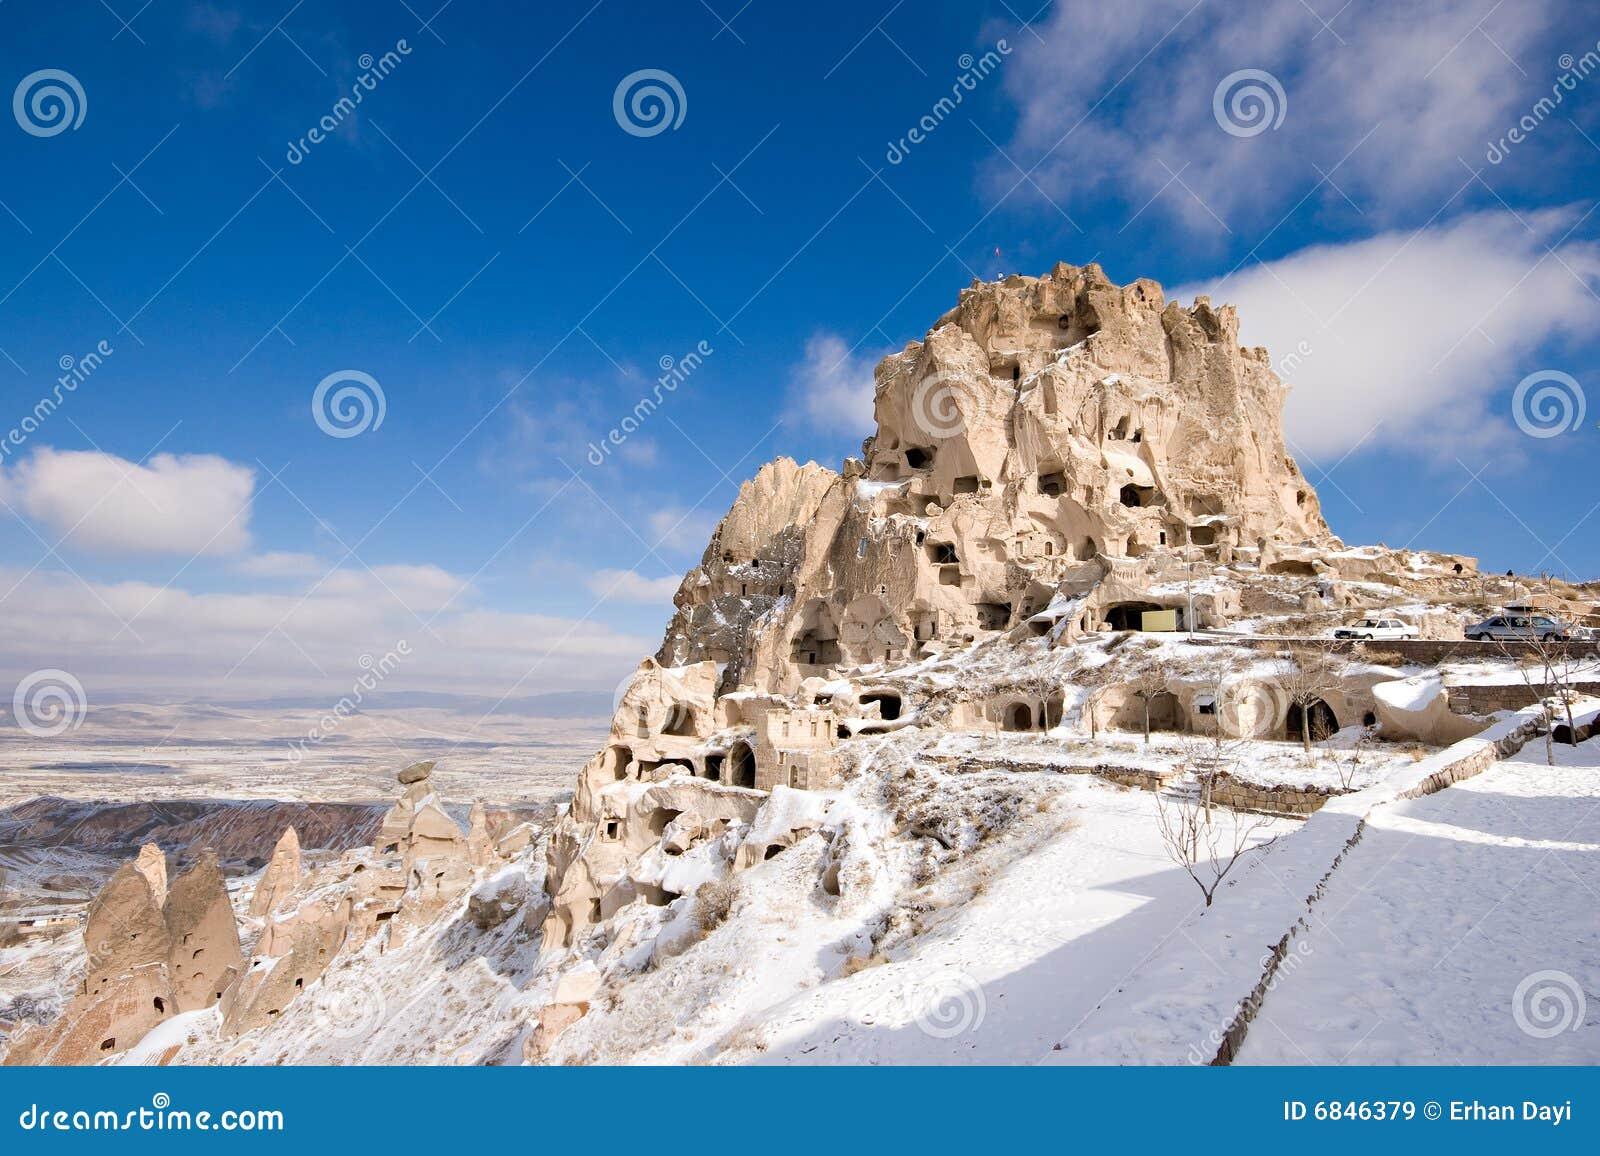 Cappadocia/ Uchisar Castle